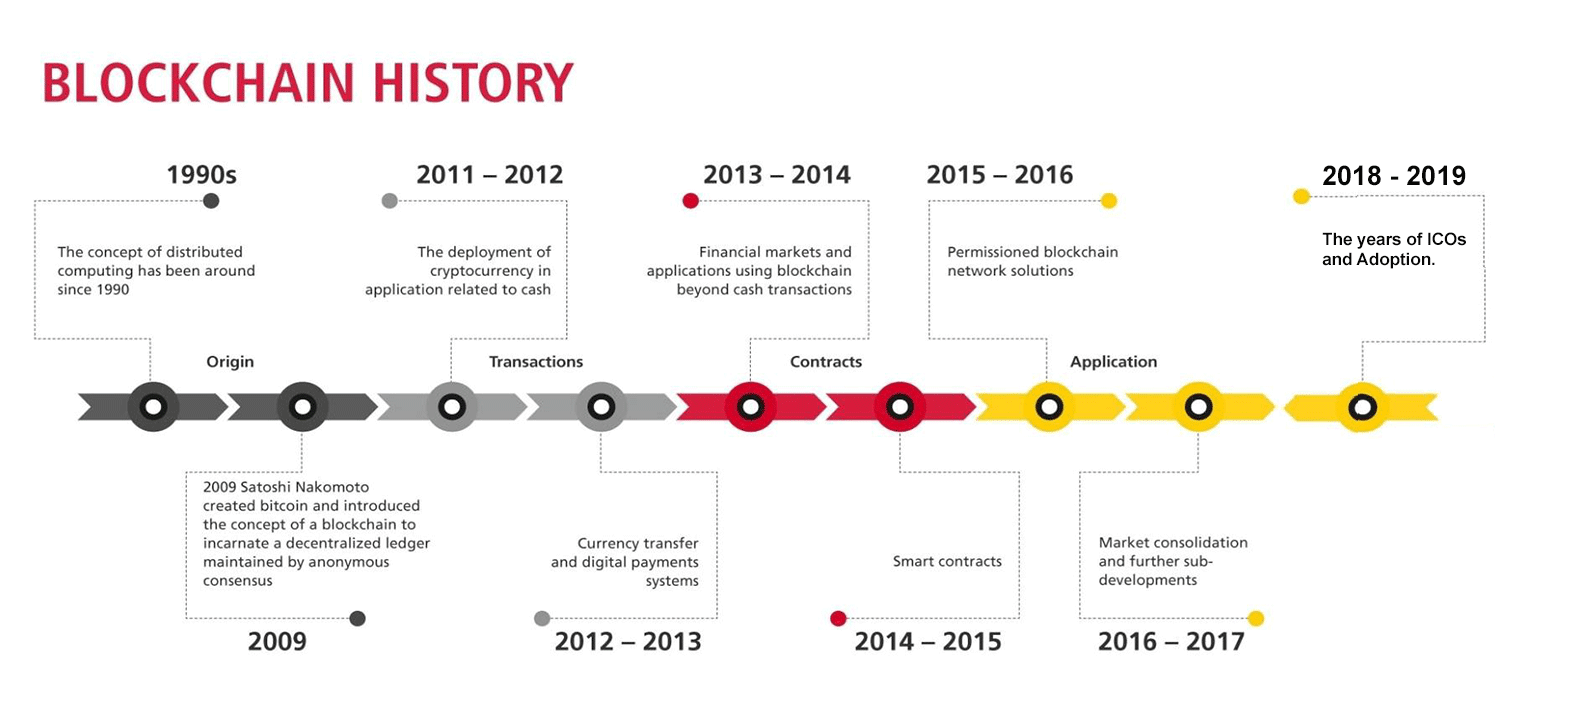 Brief blockchain history